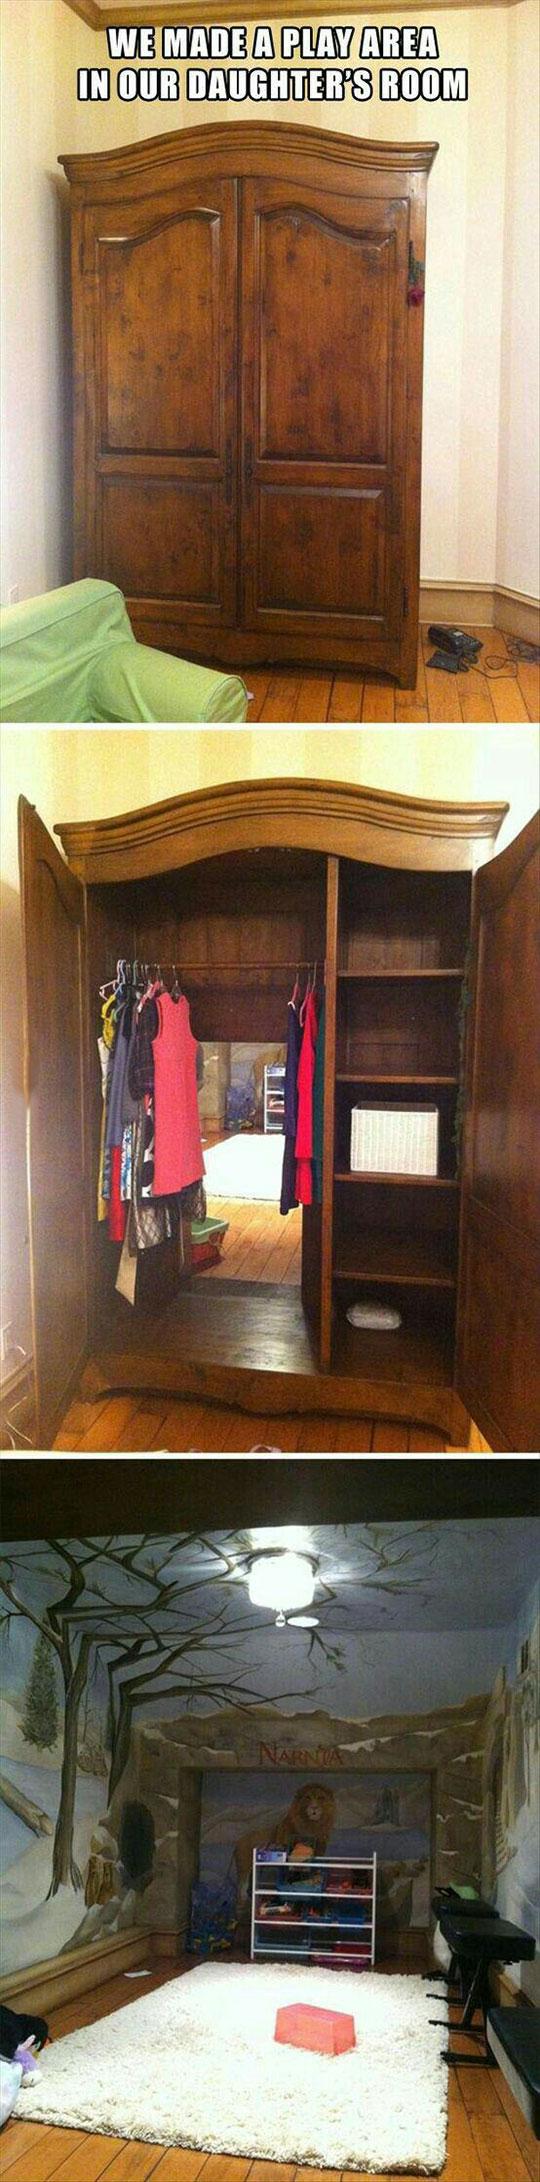 funny-cool-Narnia-wardrobe-room